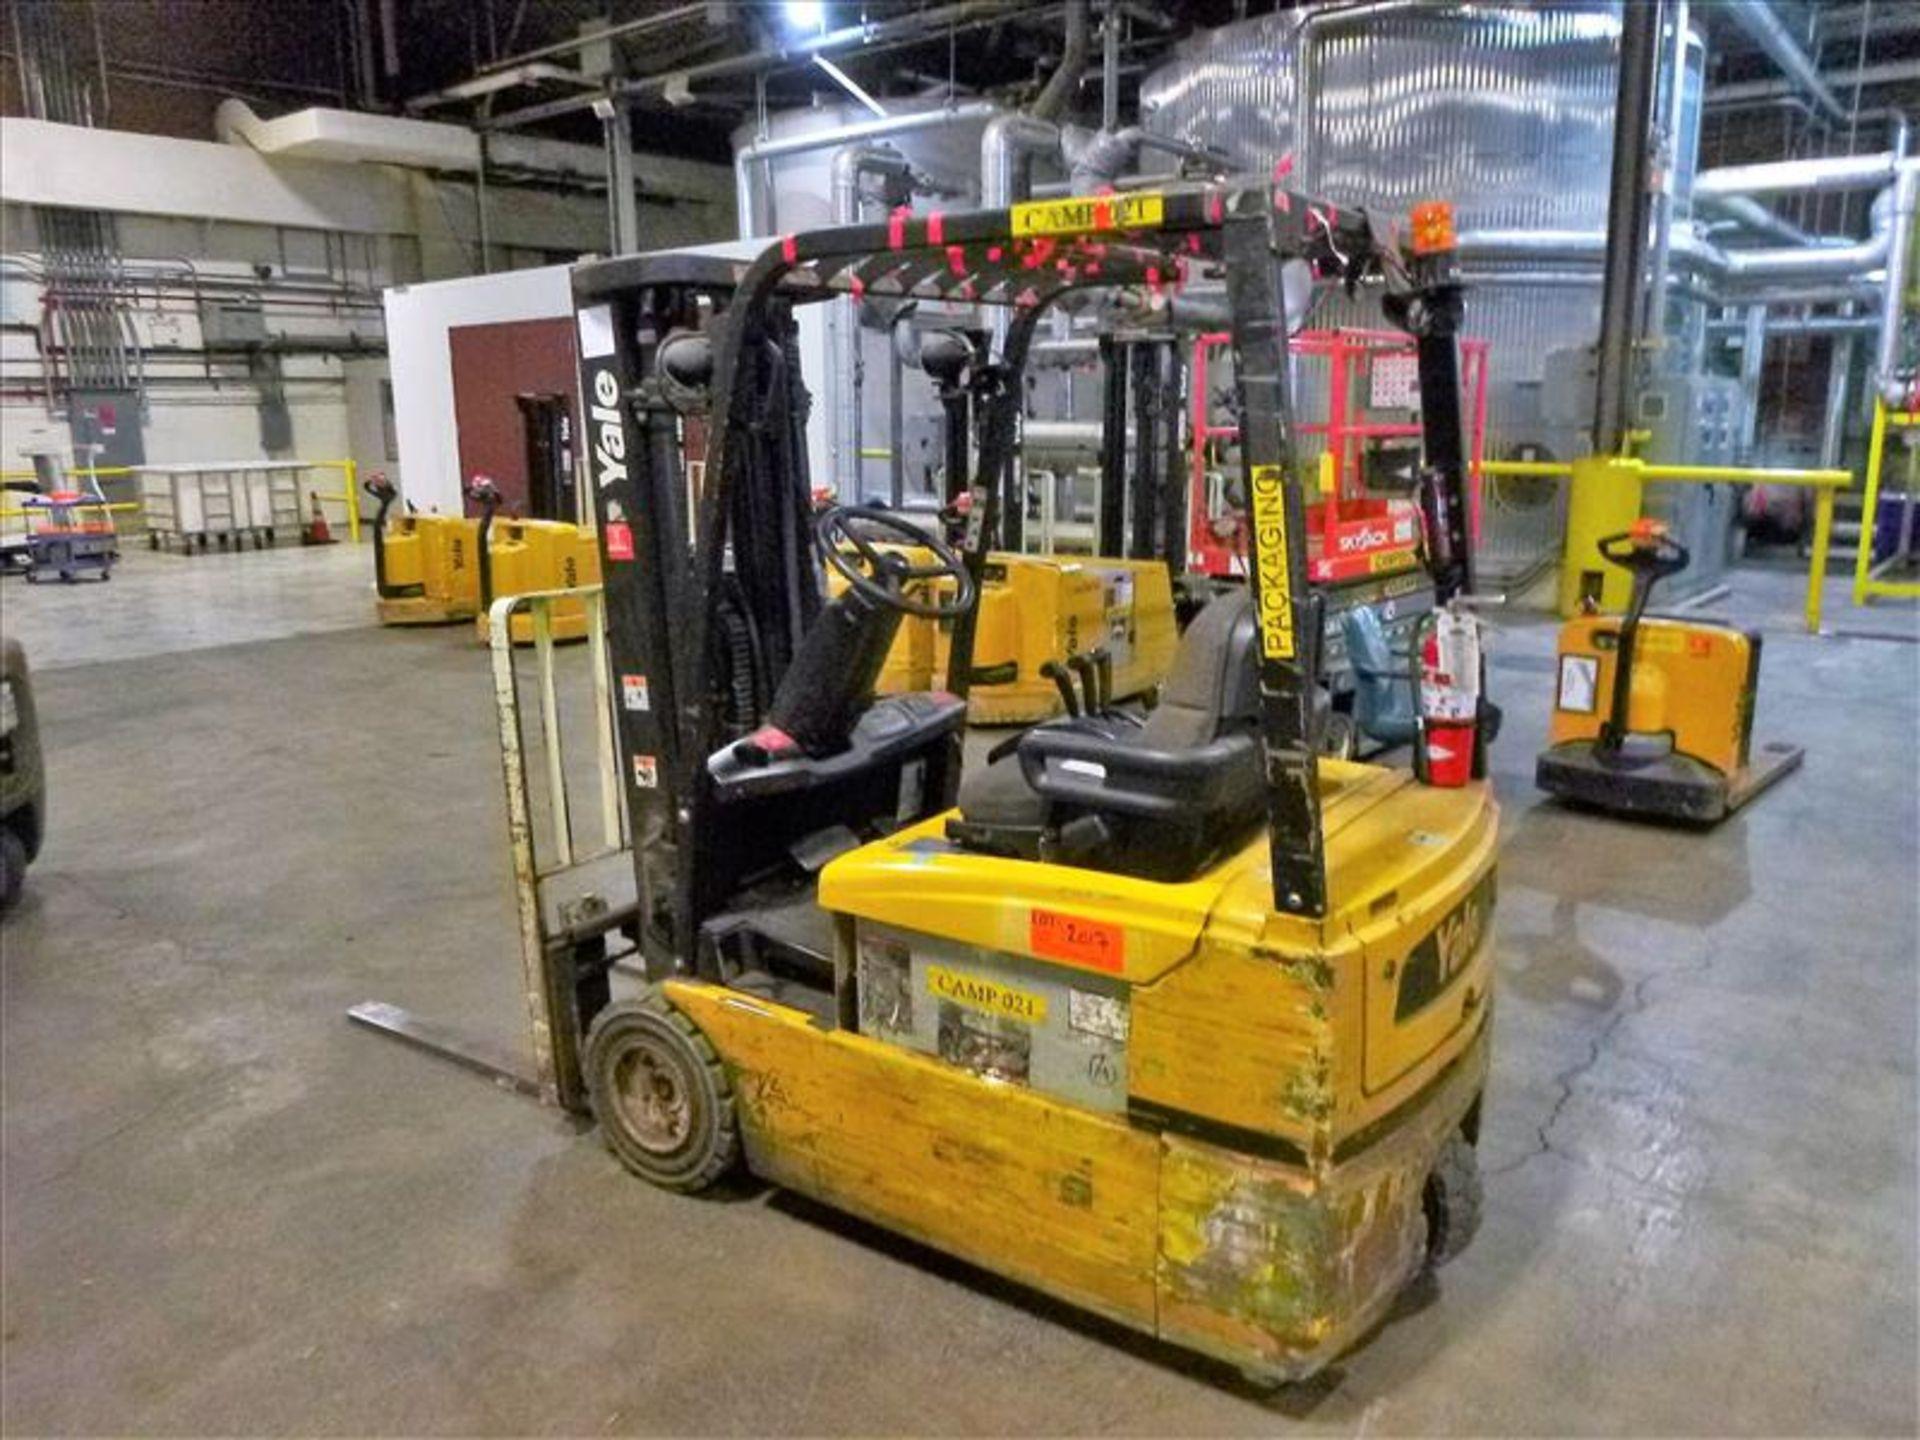 Yale fork lift truck, mod. ERP040VTHN48TE078, ser. no. F807N03990D, 48V electric, 3700 lbs cap., 175 - Image 2 of 4